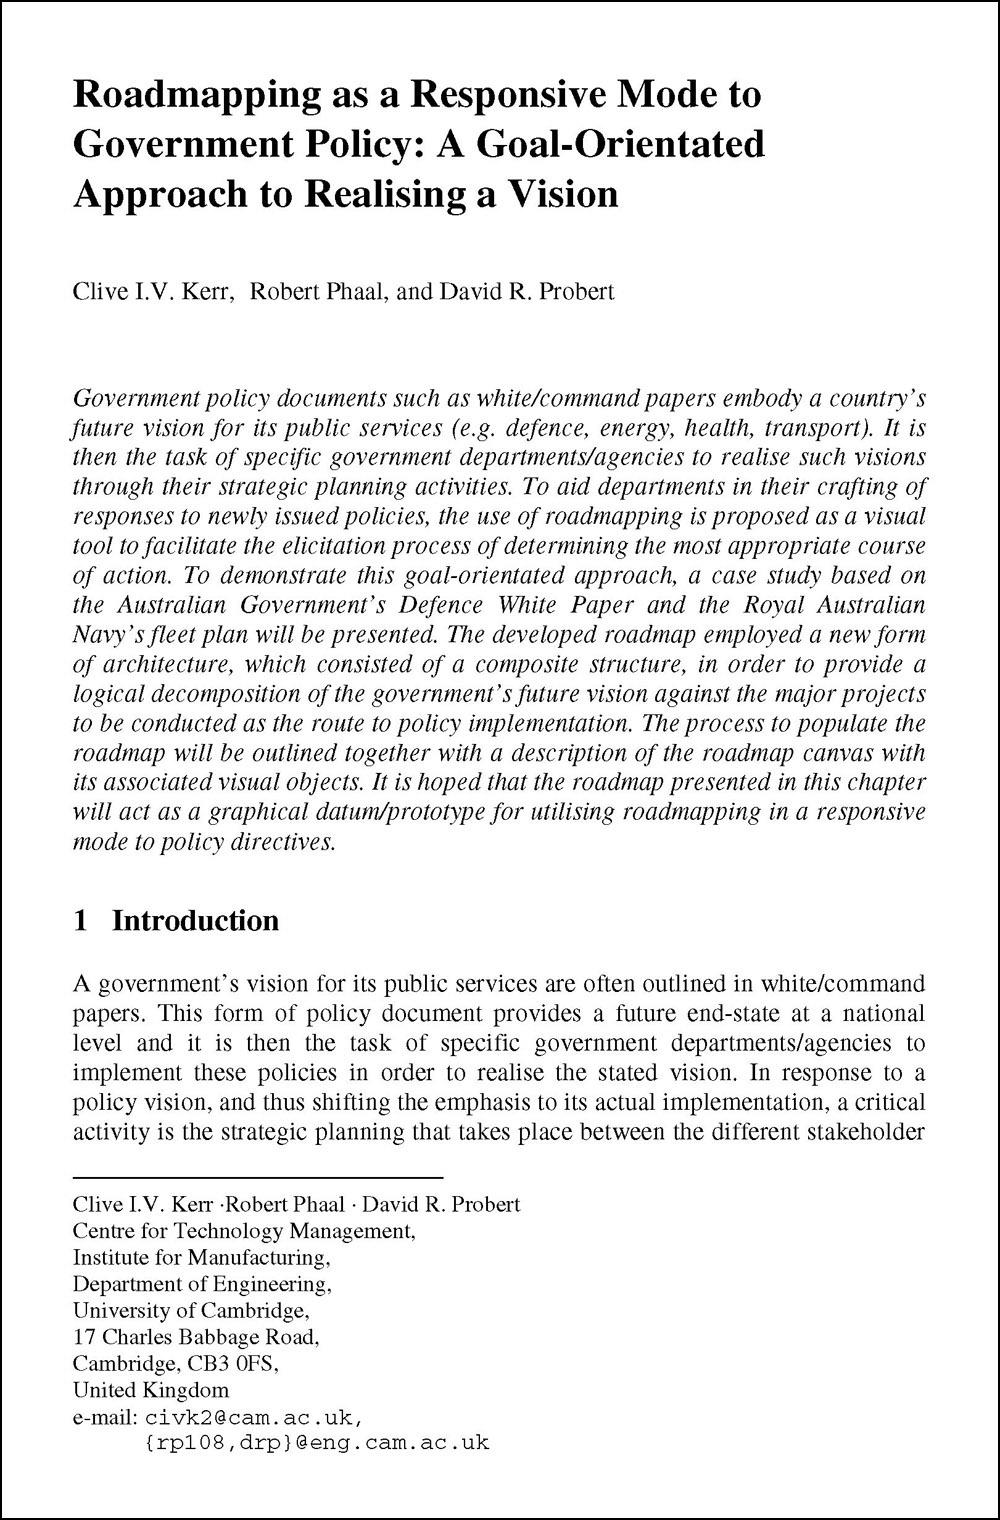 publications-möhrle2013.jpg